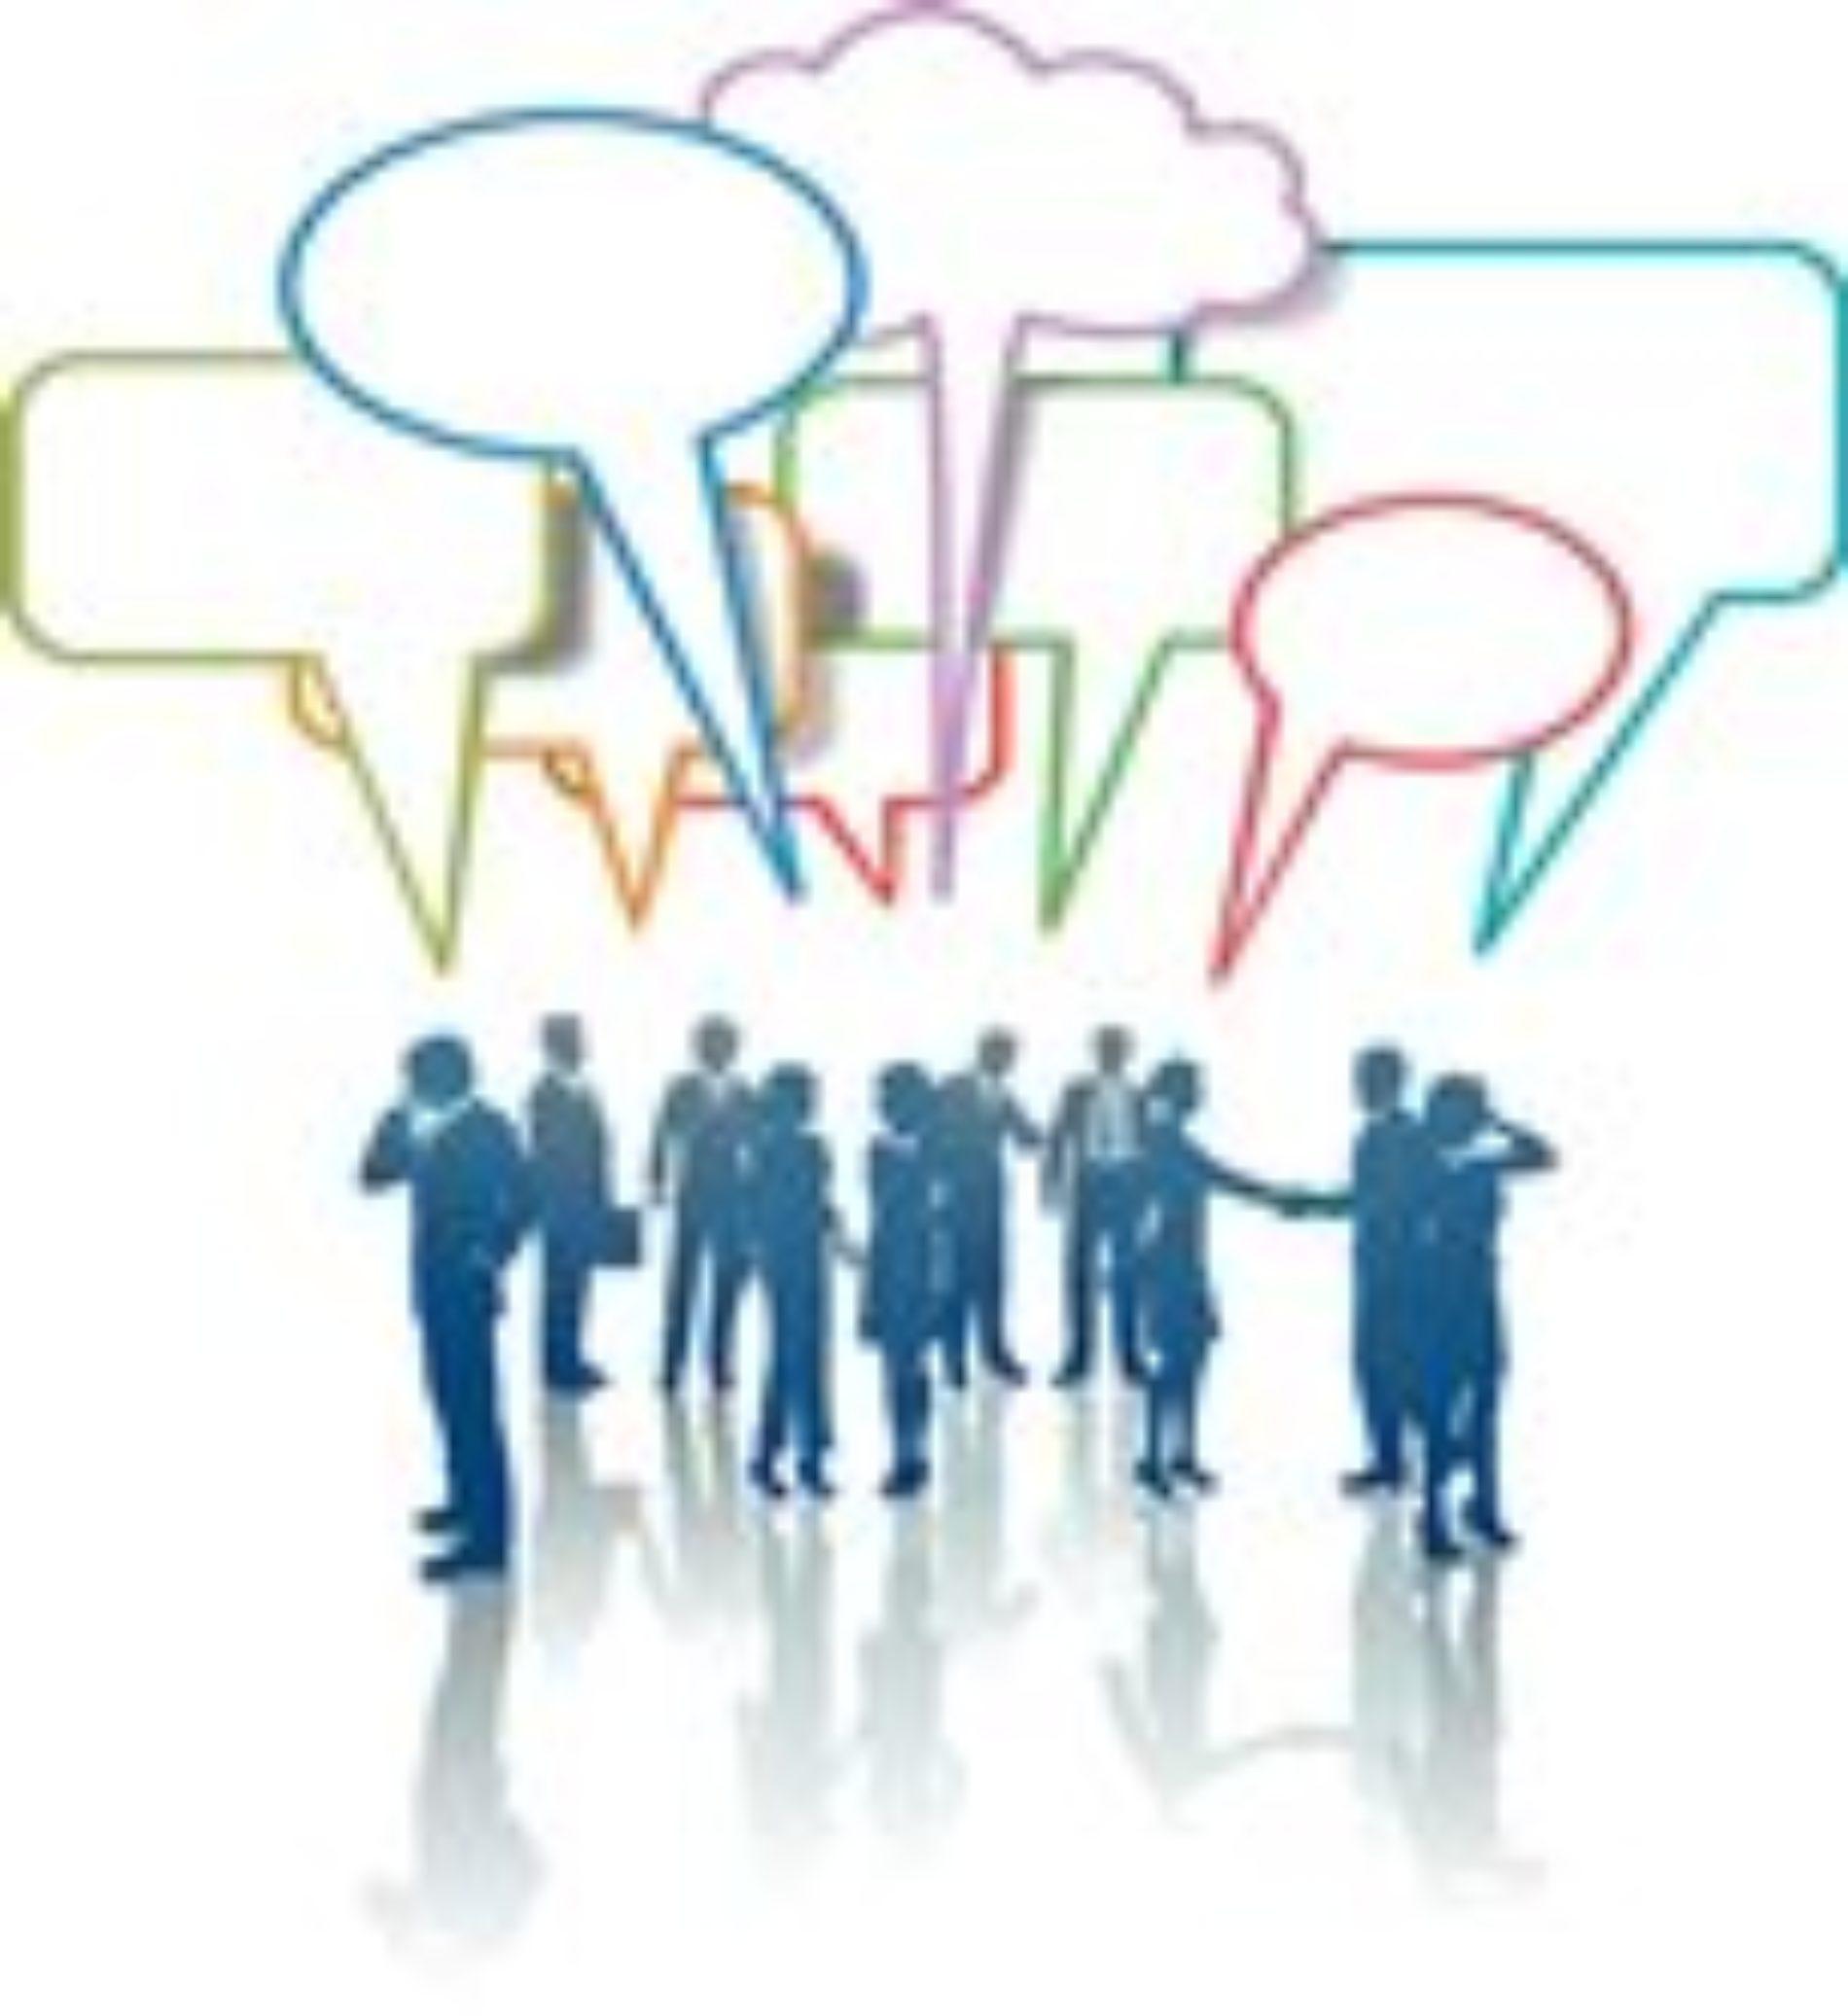 ПСИ-Технологии в переговорах